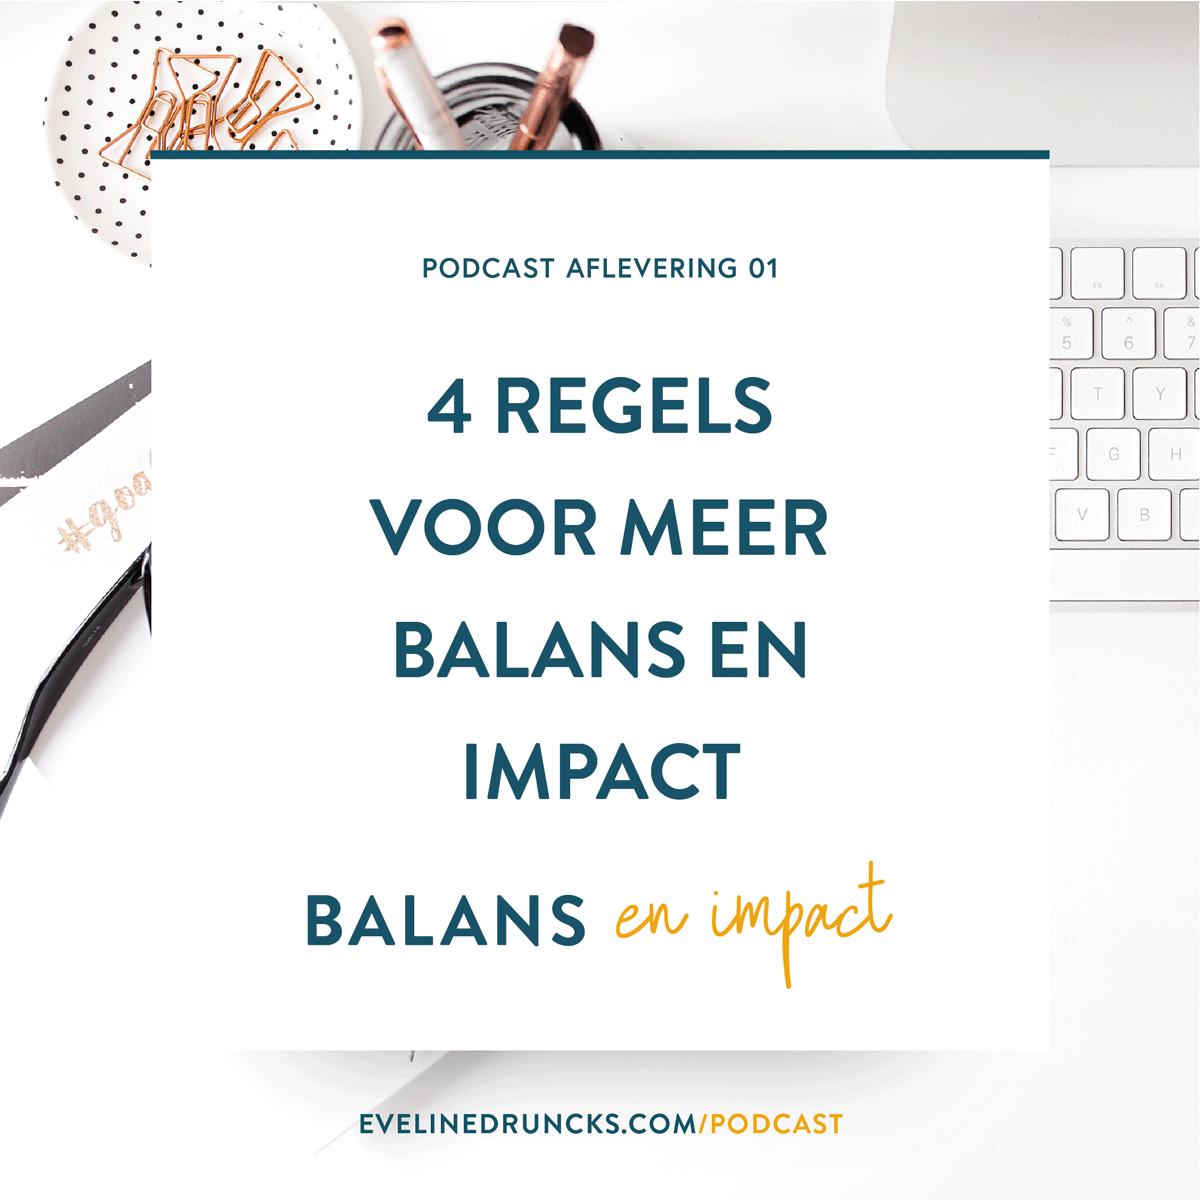 balans-en-impact-aflevering-1-4-regels-voor-meer-balans-en-impact---blog-afbeelding.png